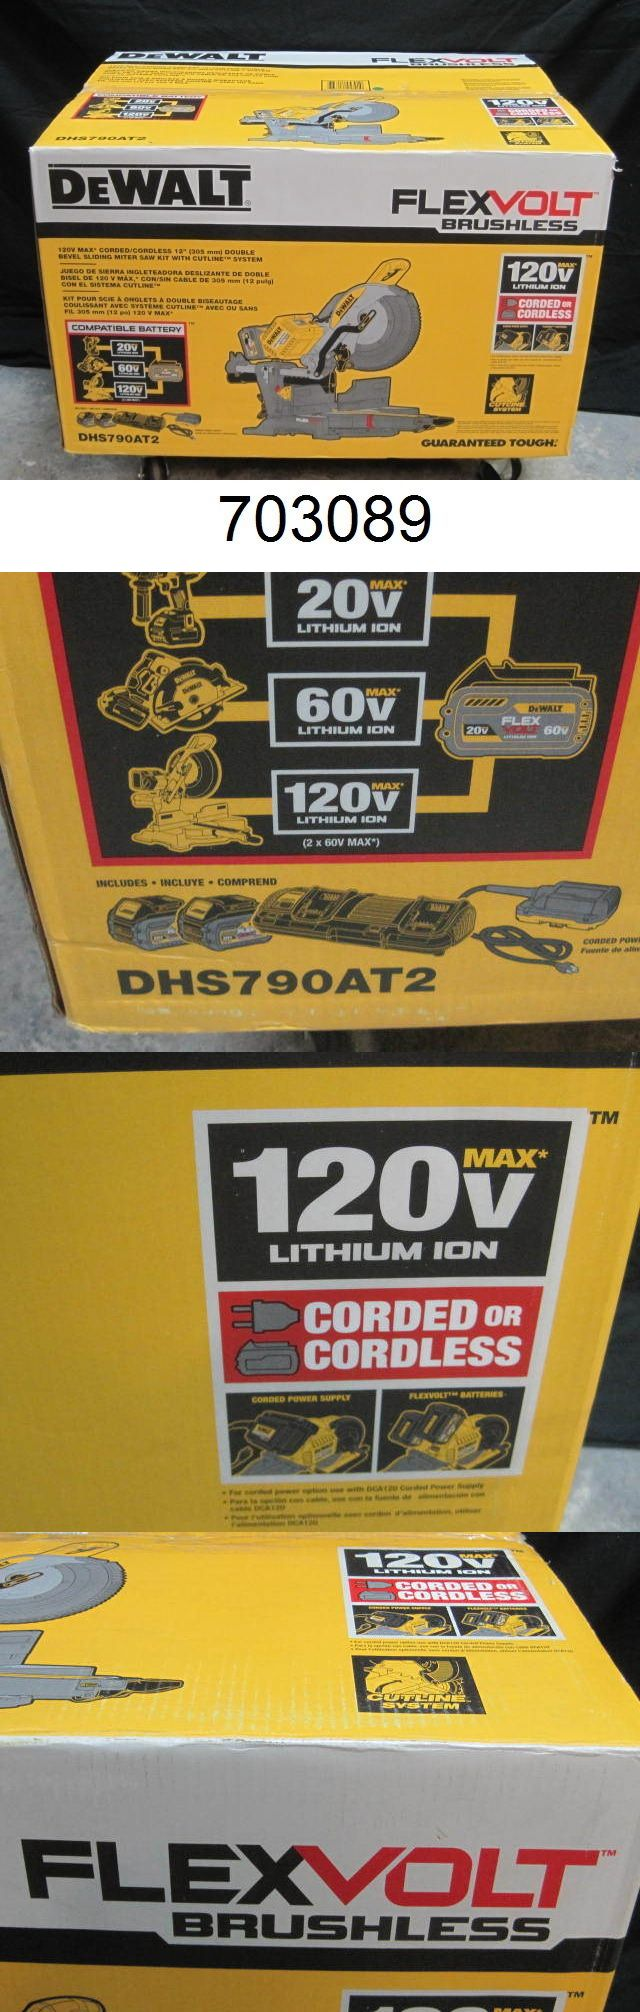 Miter and Chop Saws 20787: Dewalt Dhs790at2 Flexvolt 120V Max Double Bevel Compound Sliding Miter Saw -> BUY IT NOW ONLY: $649.99 on eBay!